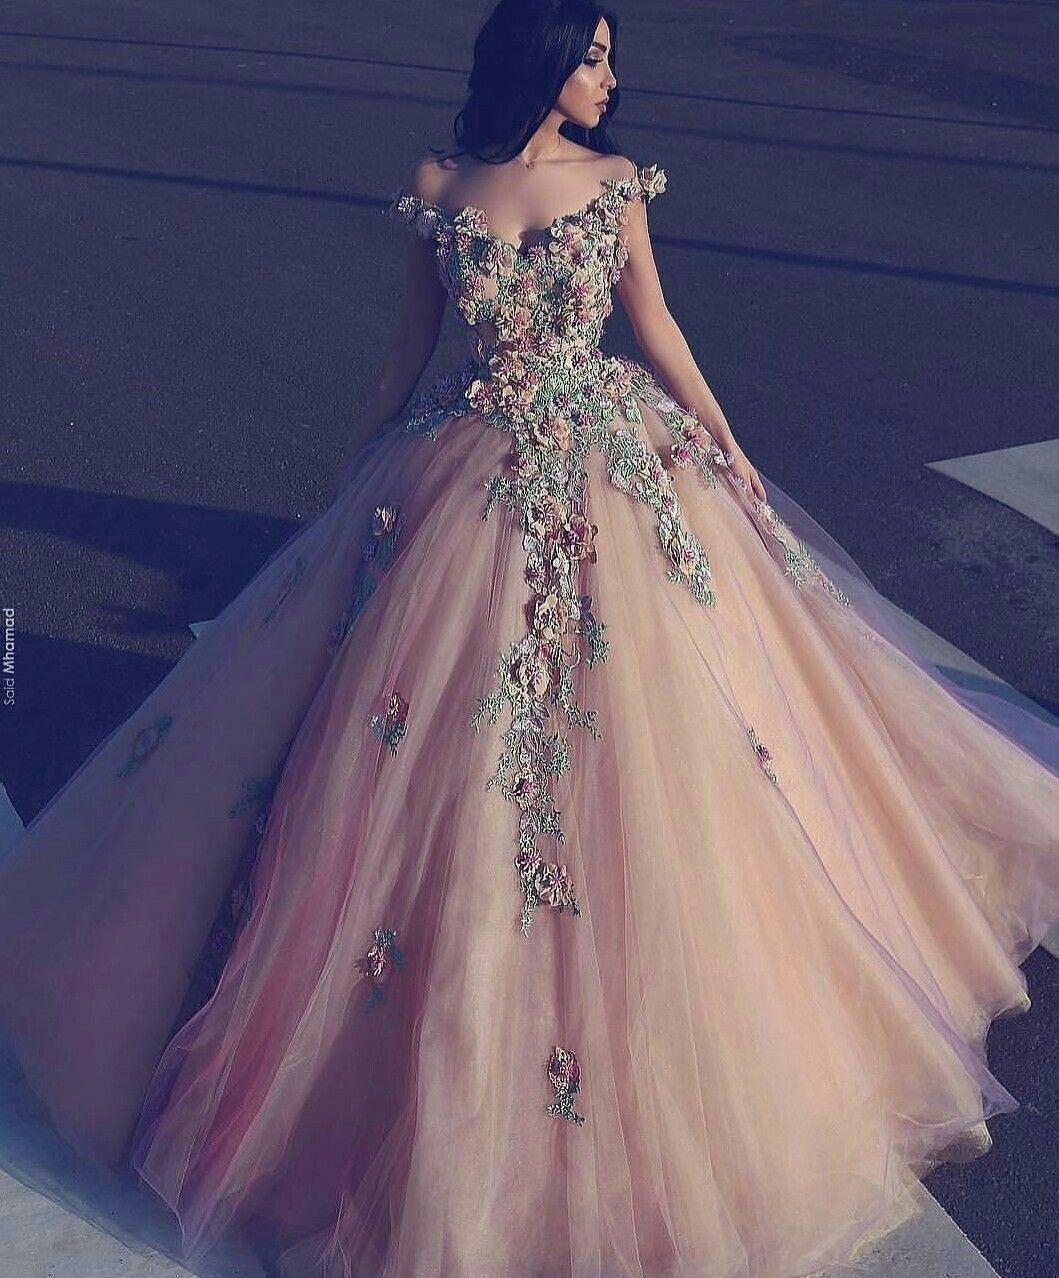 Pin by ana peñuñuri on style pinterest prom gowns and princess